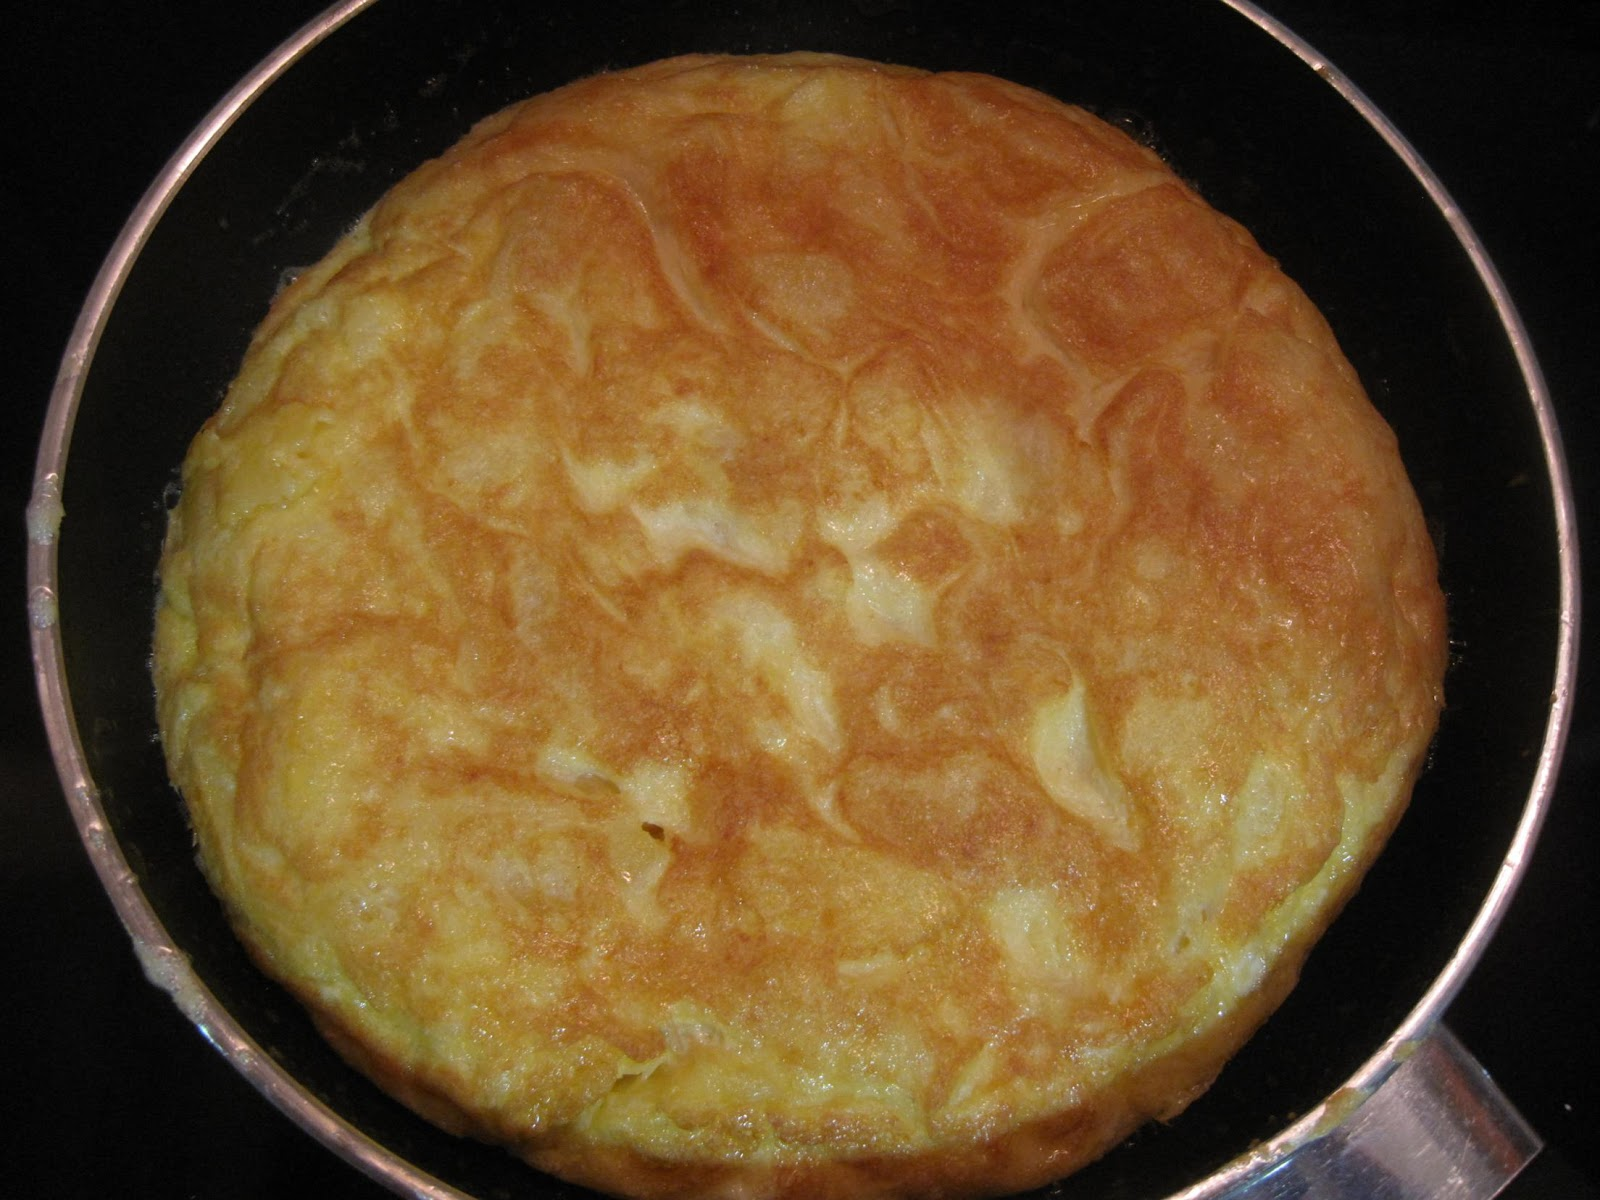 http://www.missoluciones-pangala.com/index.php/tortilla-patata-light-sin-ensuciar/